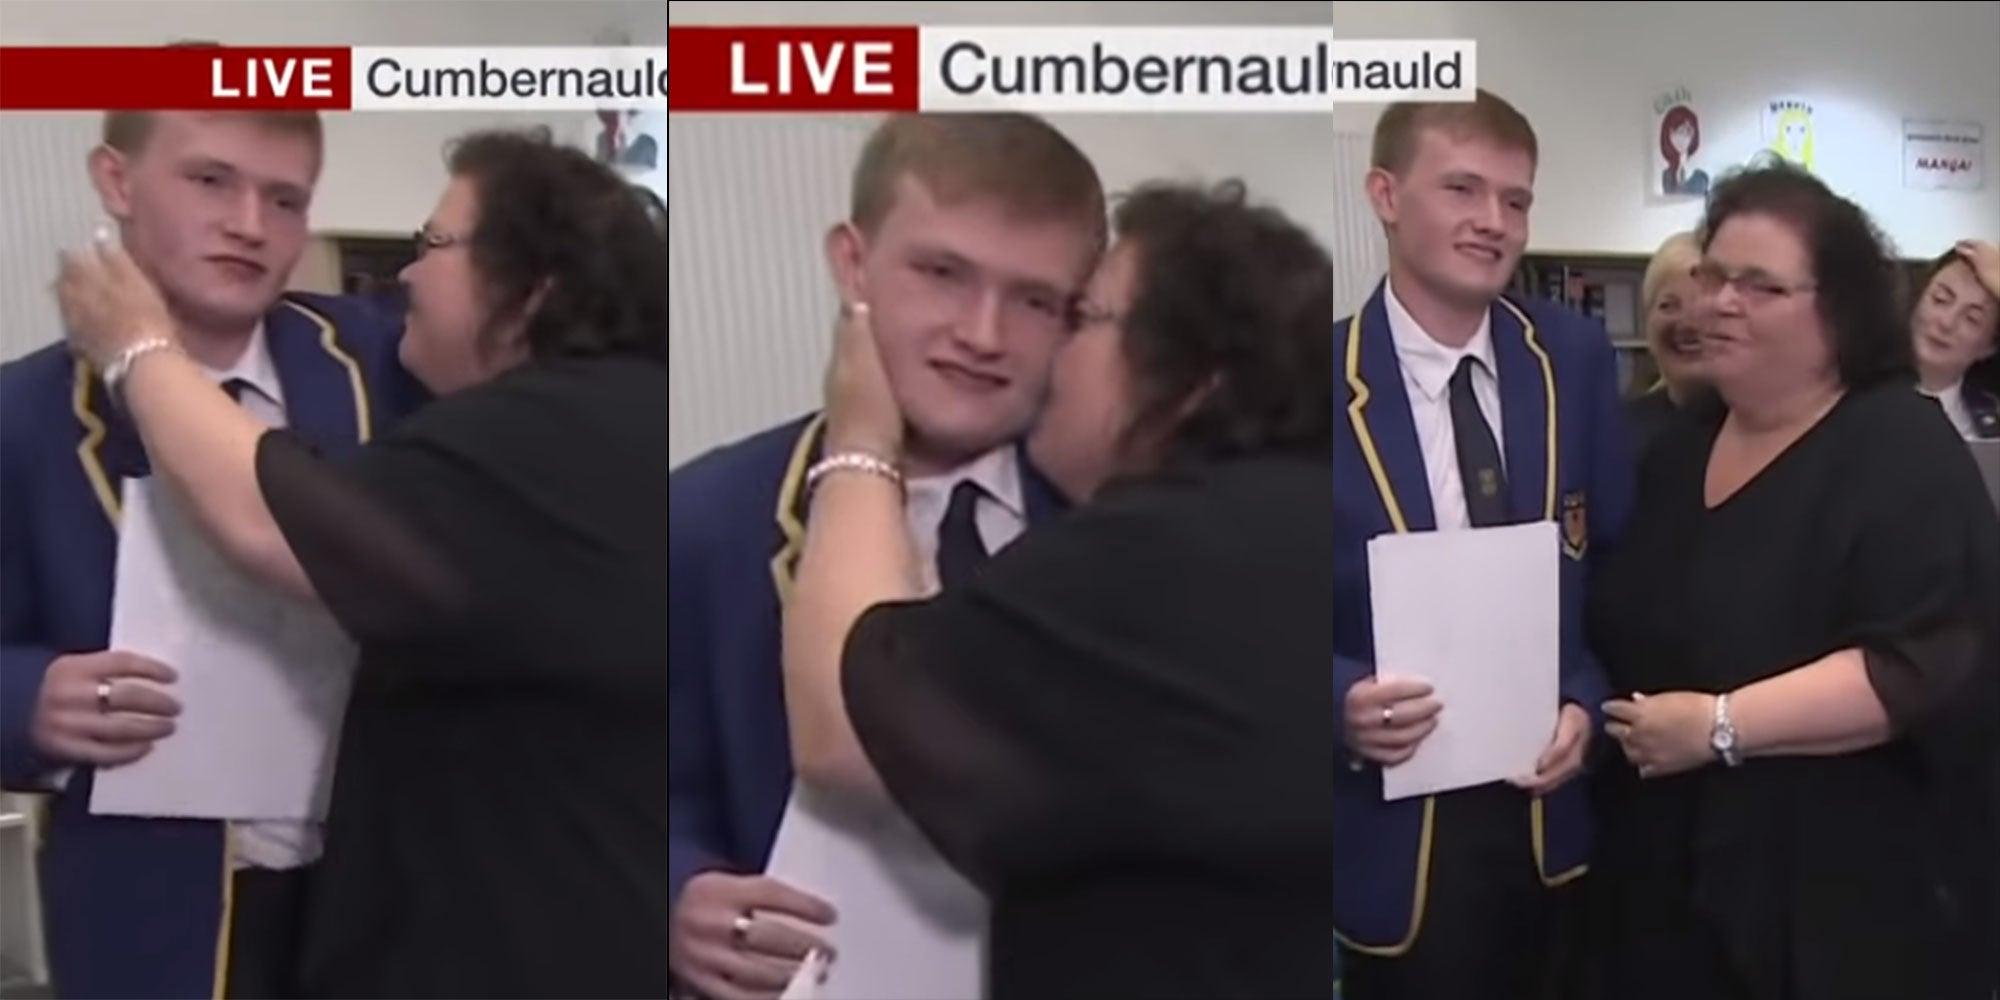 scottish exam results 2018: student embarrassedmum kissing him